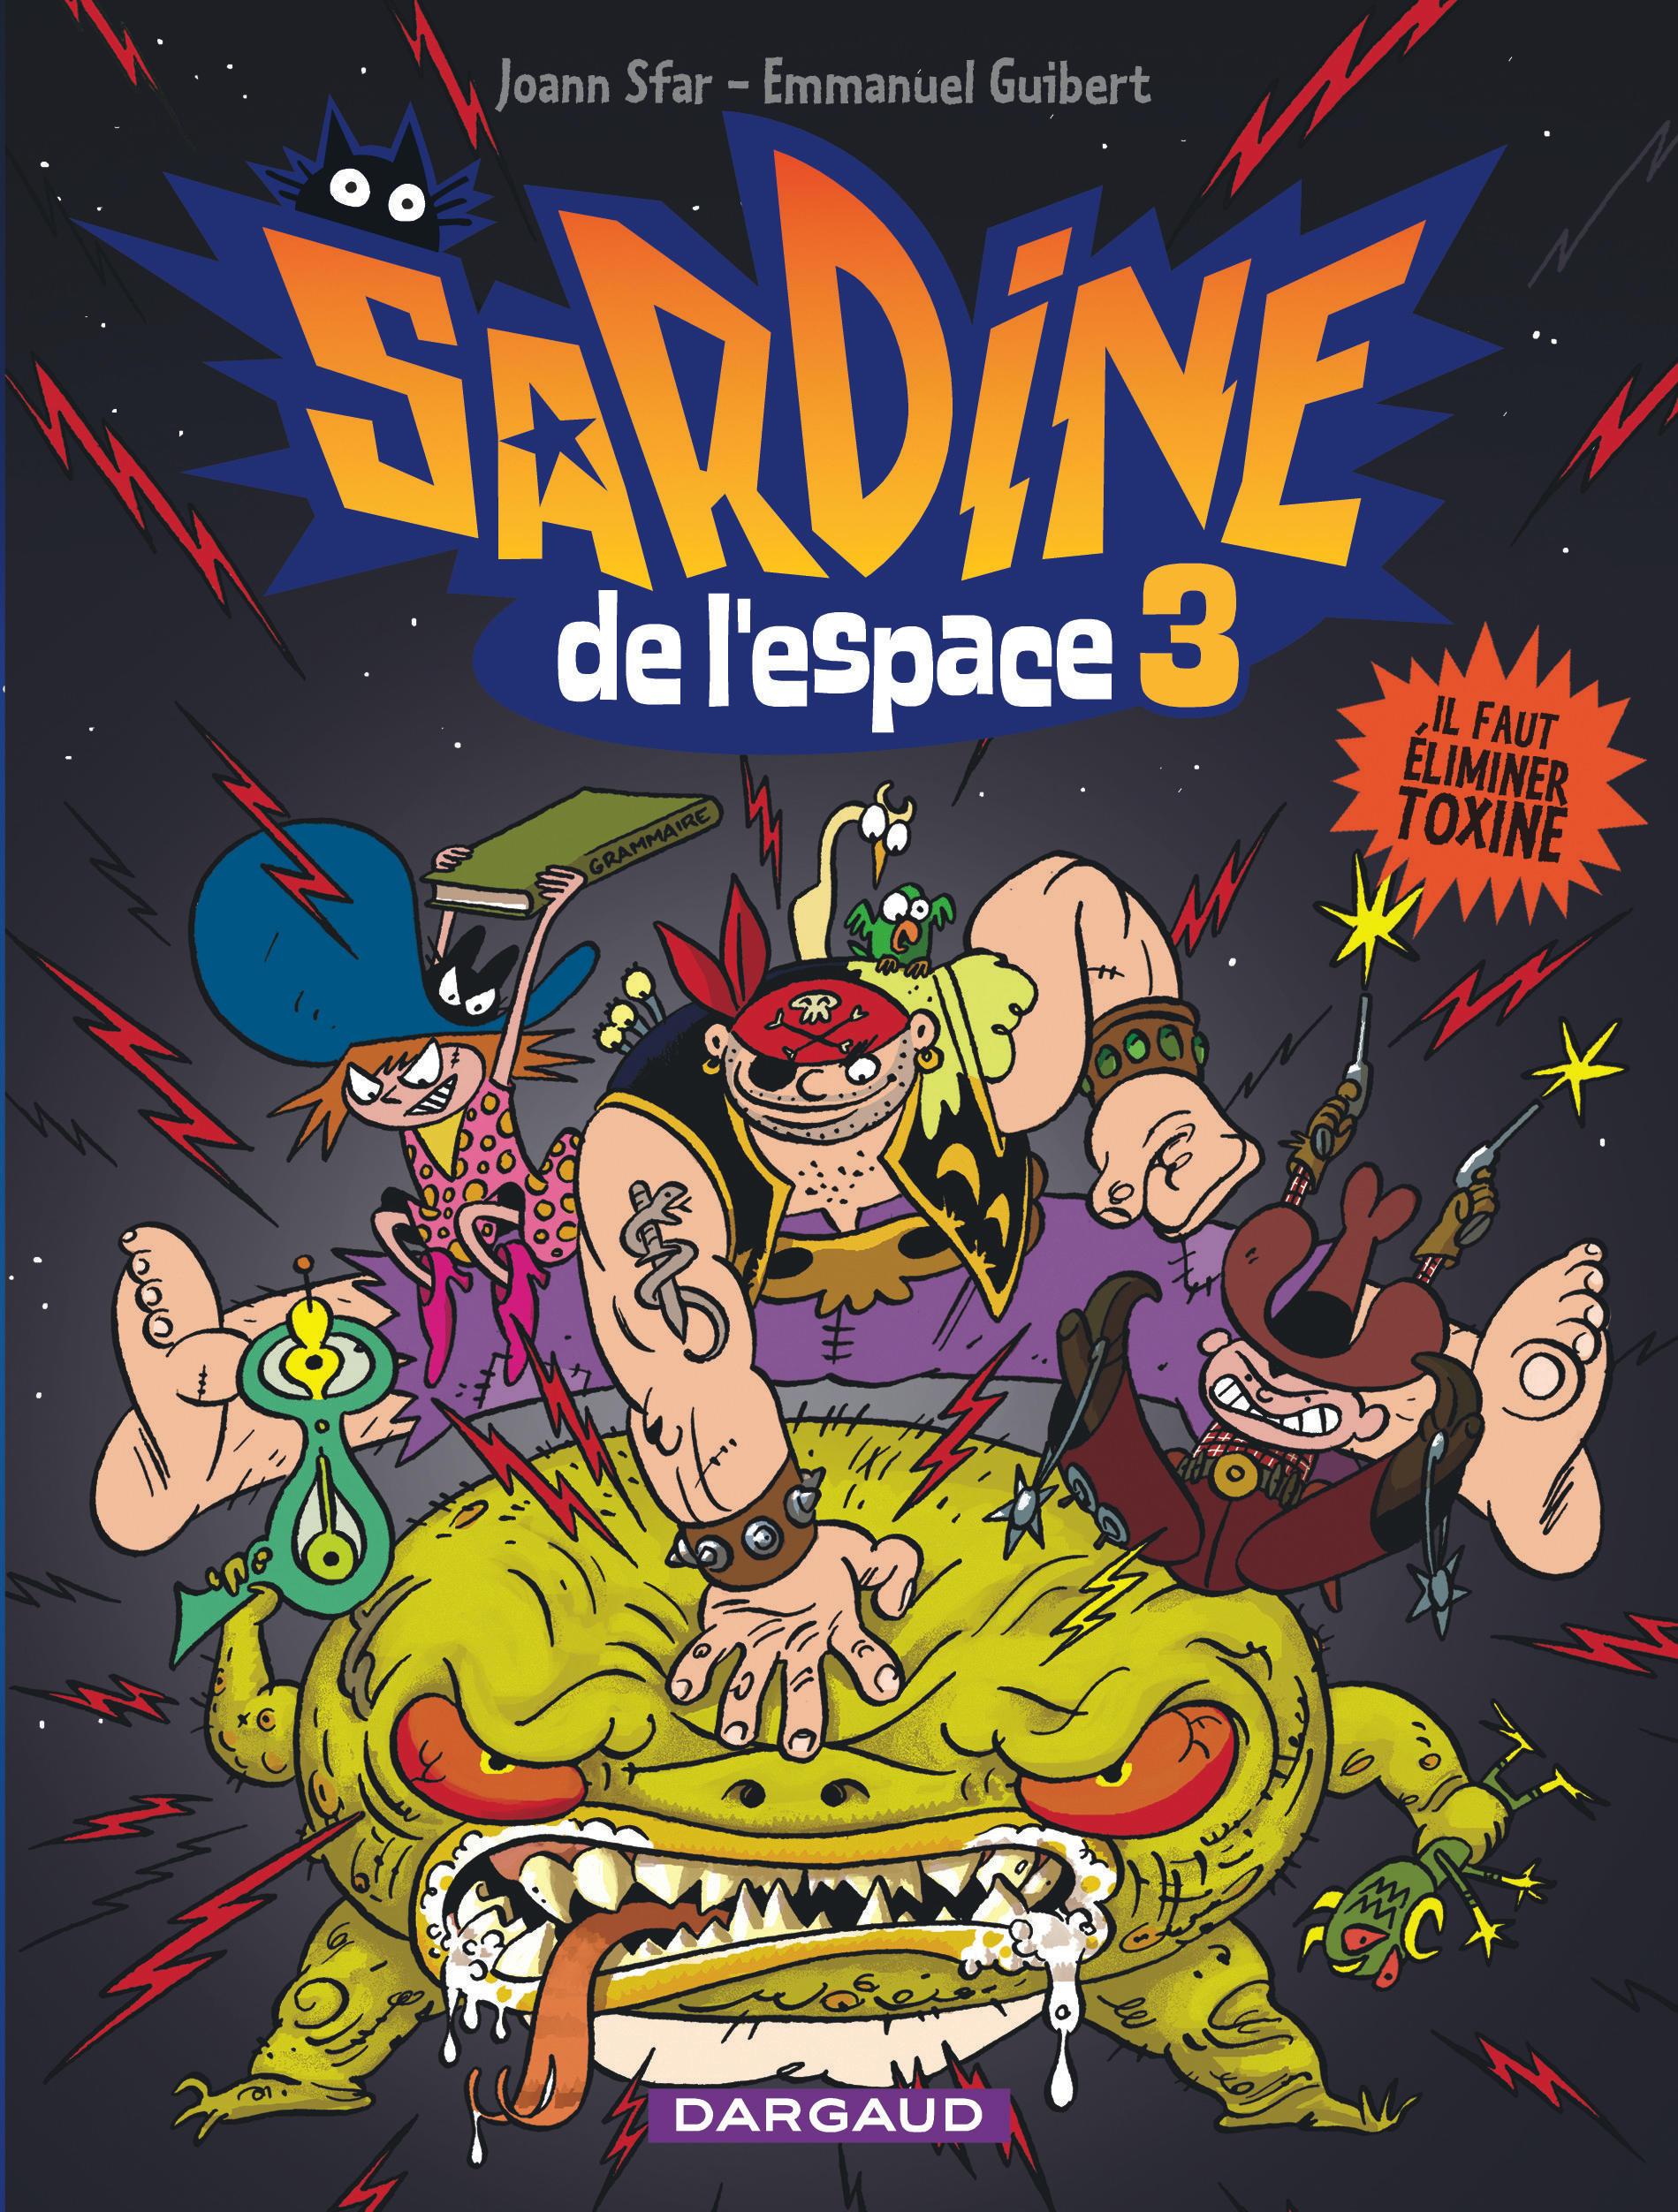 sardine de l u0026 39 espace tome 3  il faut  u00e9liminer toxine